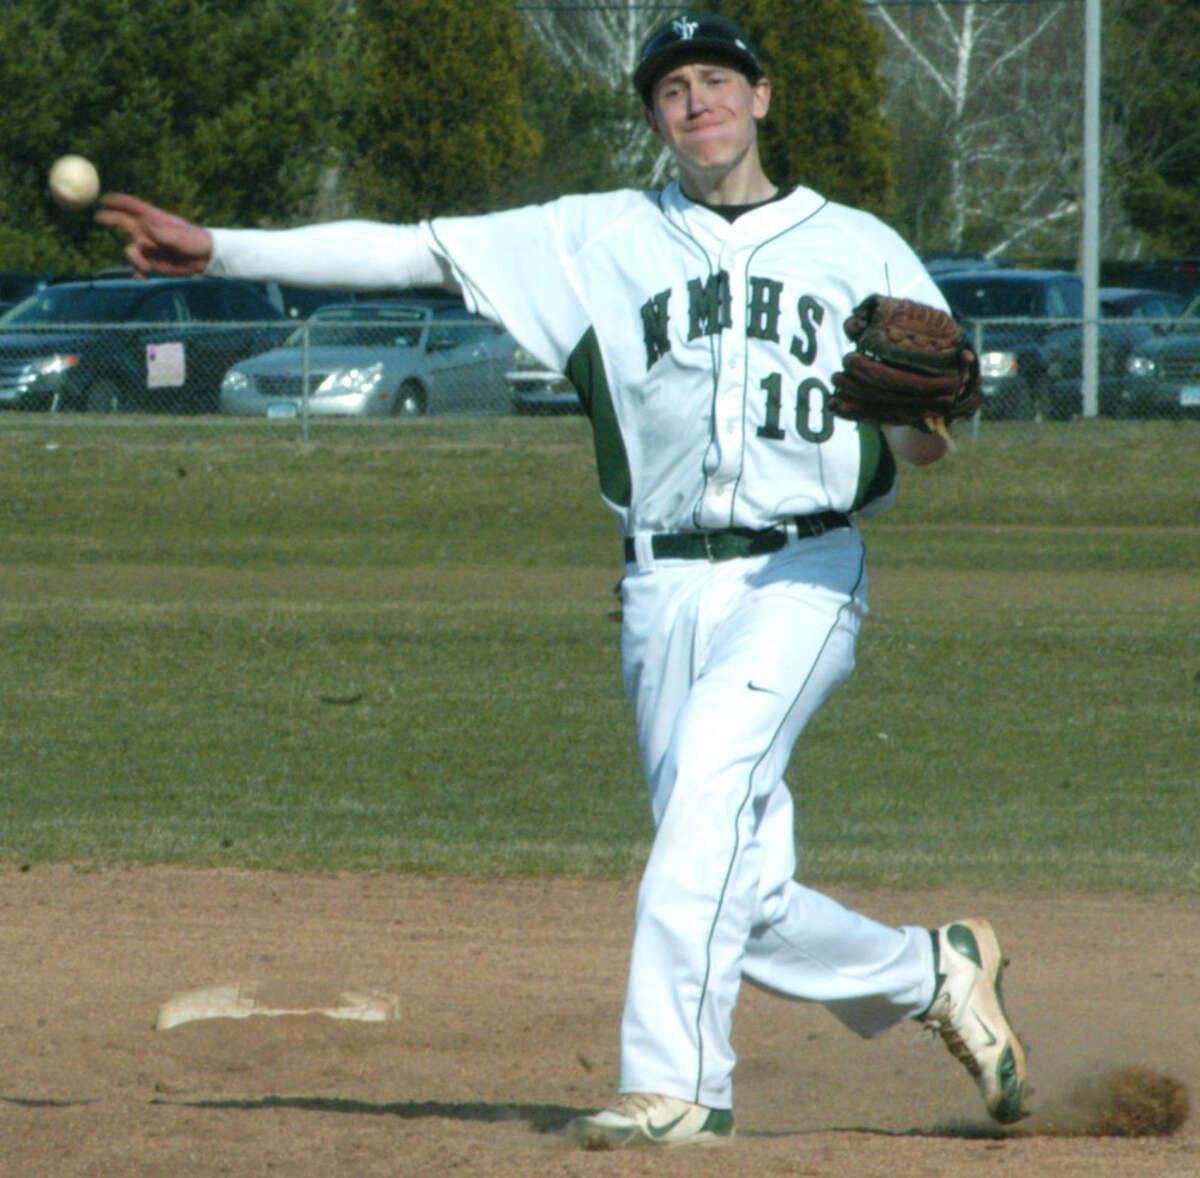 Matt Brew mans the keystone position with aplomb for New Milford High School baseball. April 2013